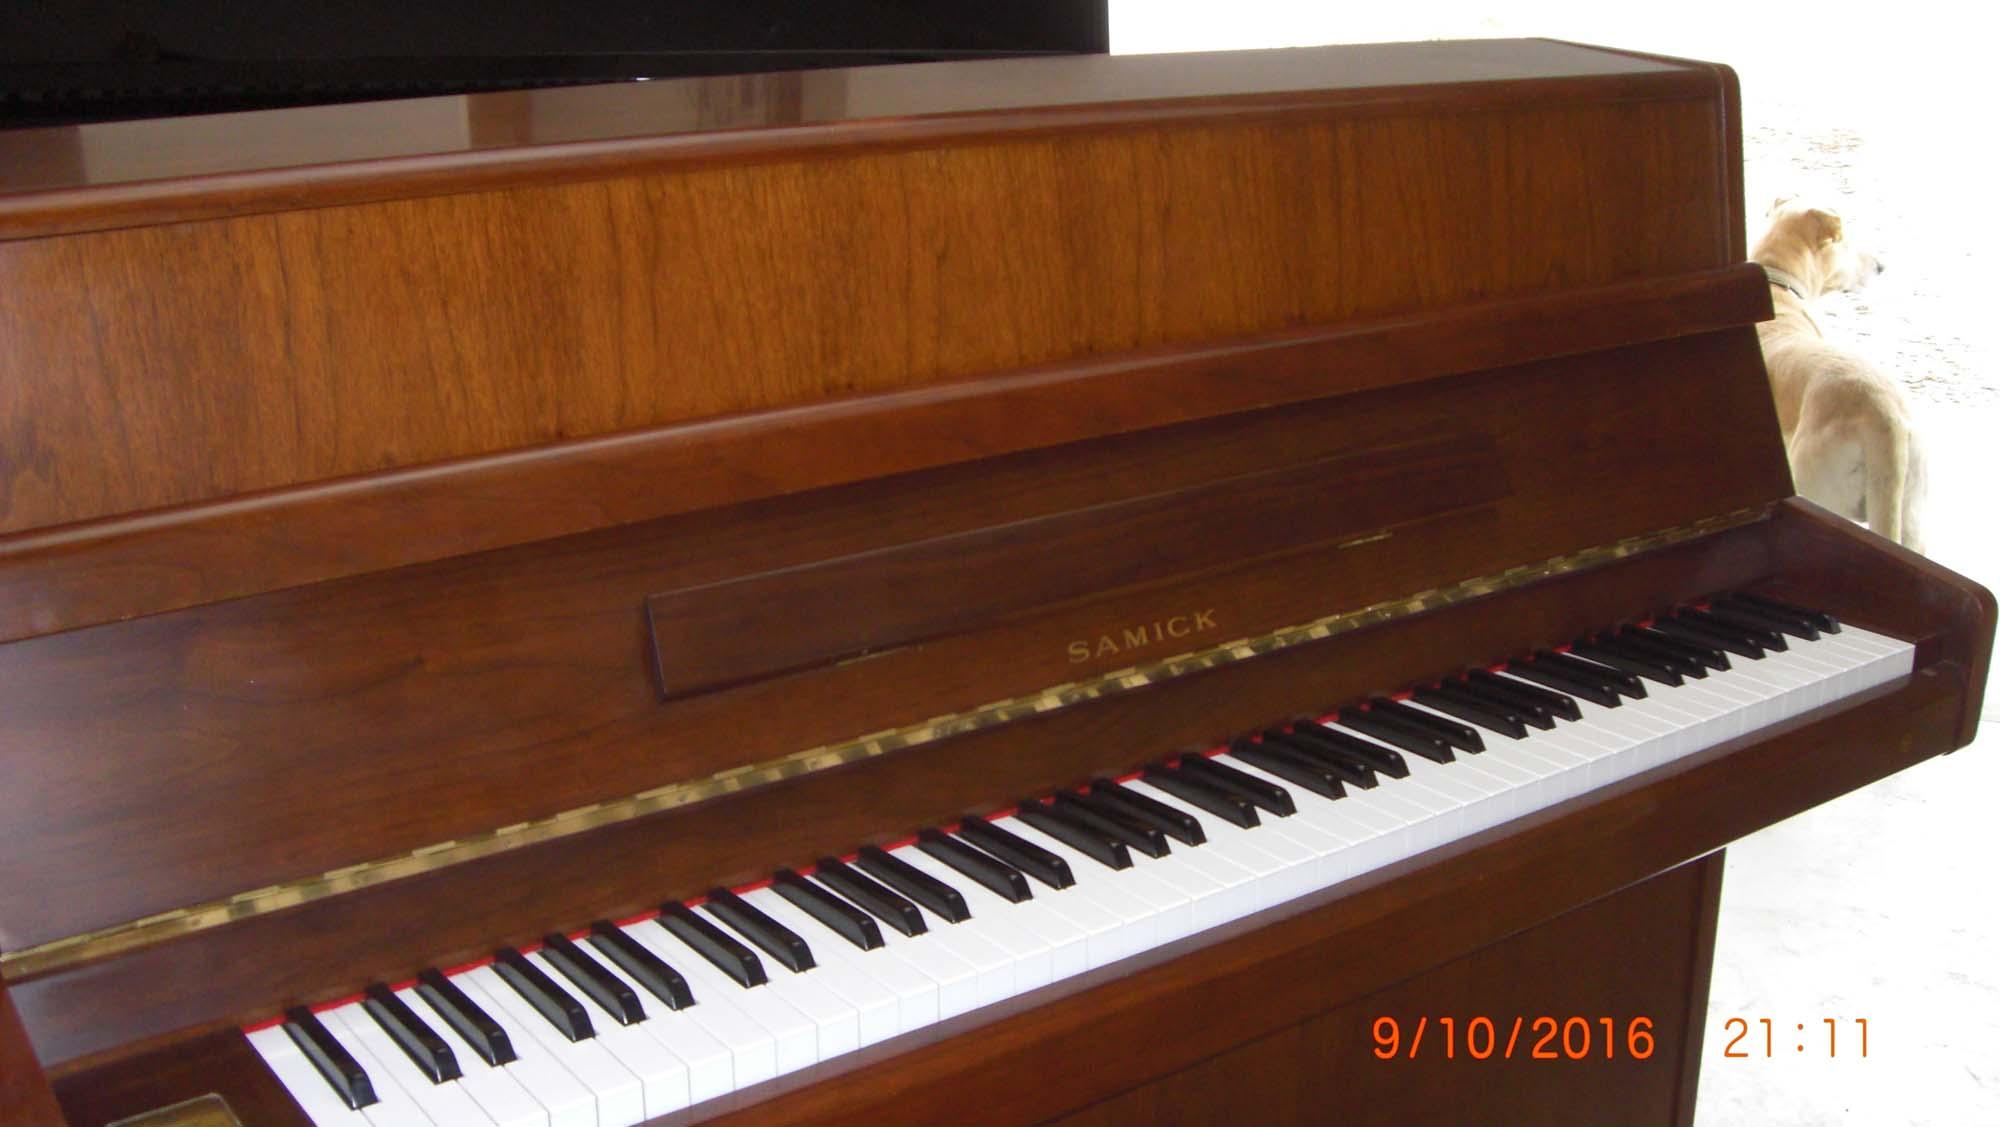 piano droit d occasion de marque samick l 39 artisan du piano en vend e. Black Bedroom Furniture Sets. Home Design Ideas